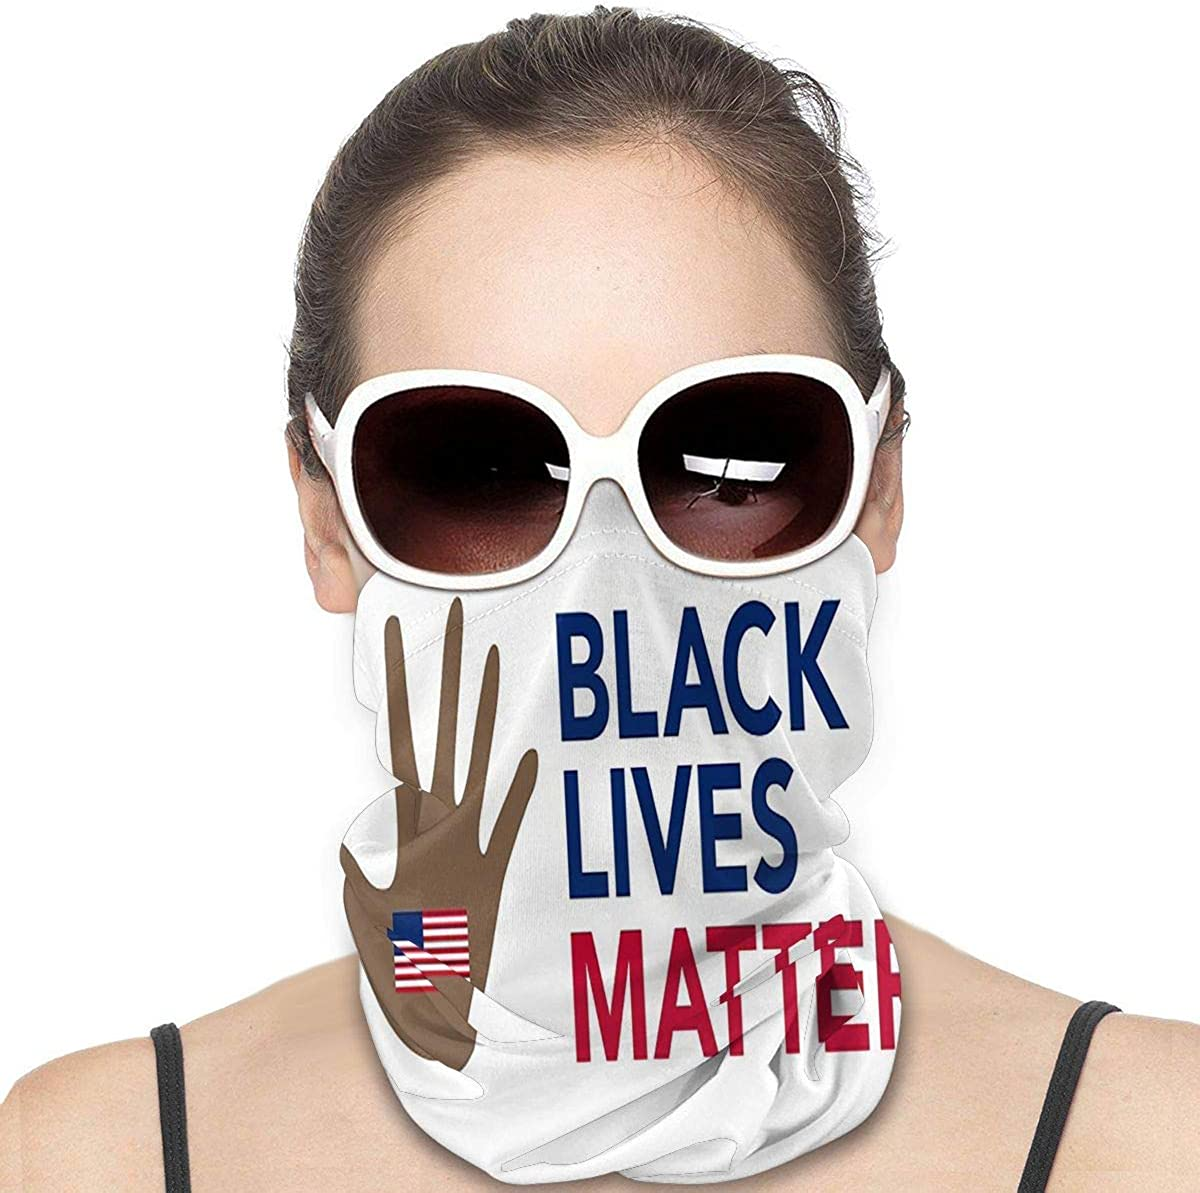 Kiuloam Women Bandanas Face Mask, Black Lives Matter Neck Gaiter Mask Headband for Men Face Scarf Dust, Outdoors, Sports